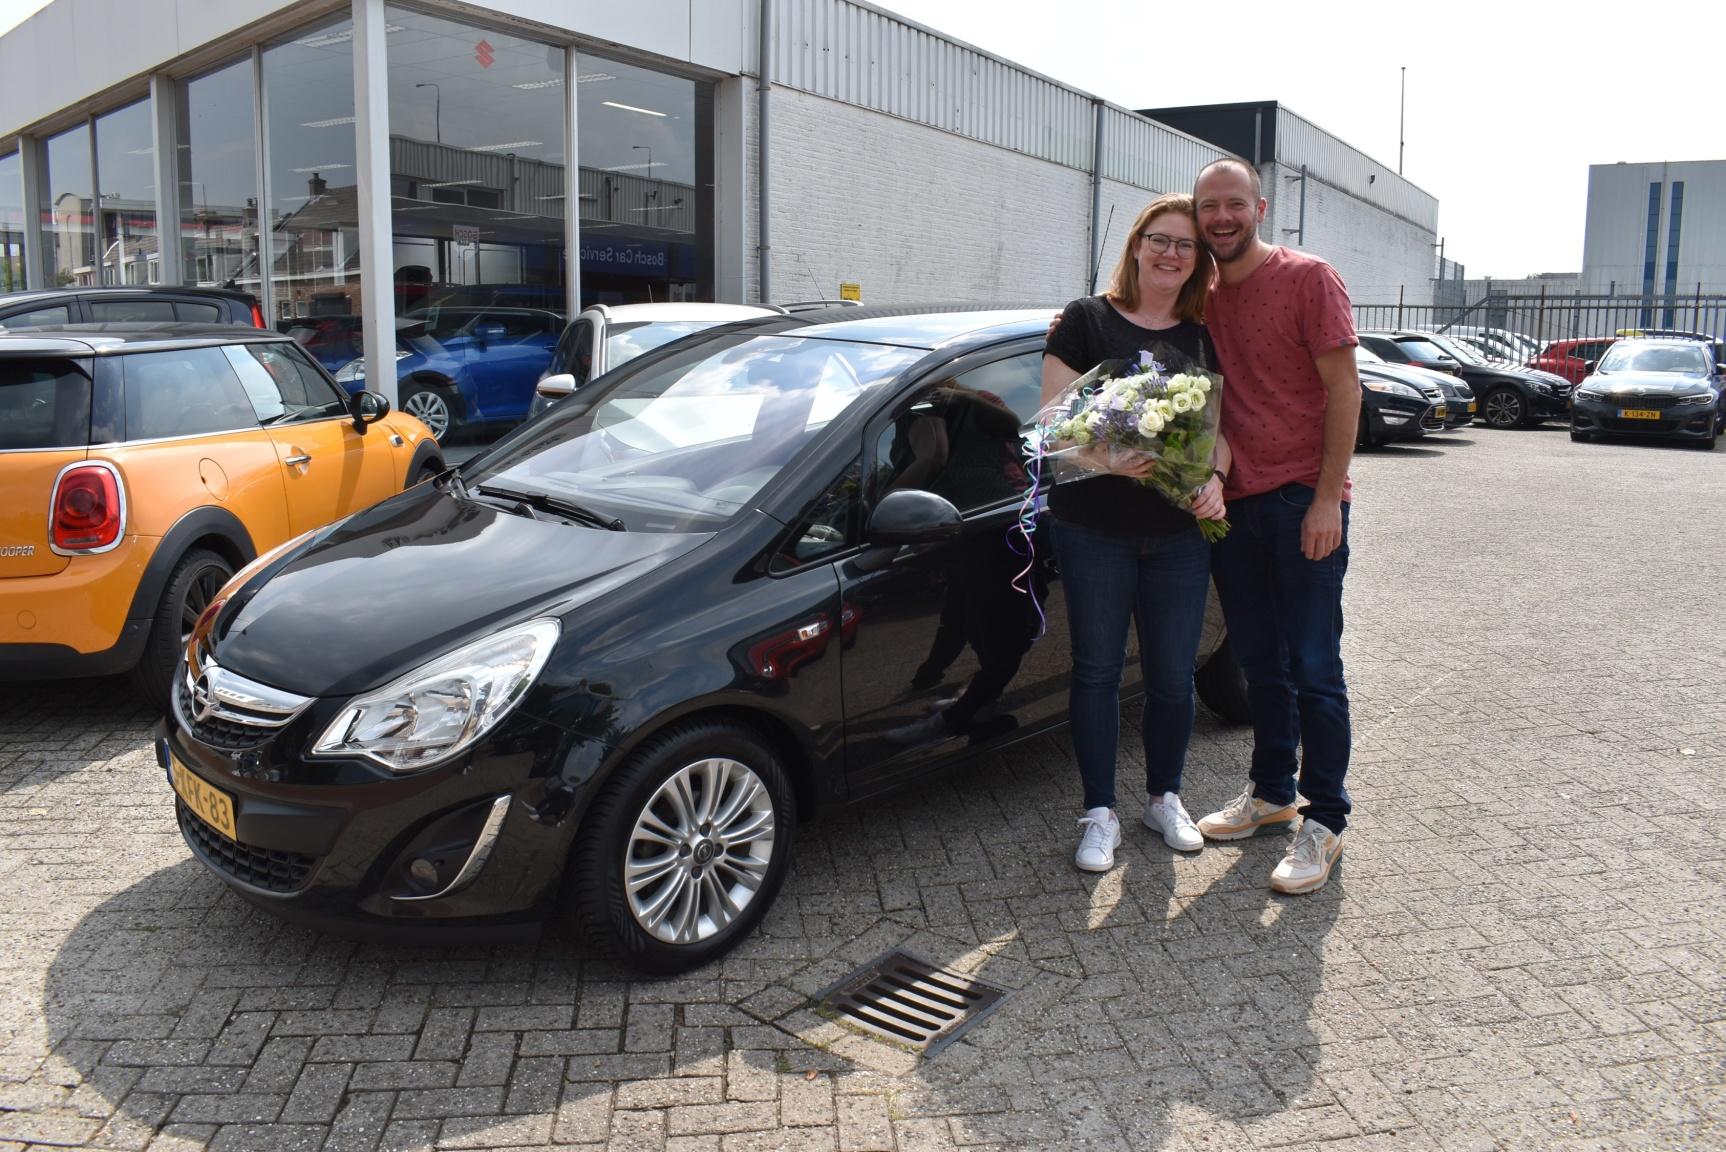 Aflevering Opel Corsa-2021-08-06 14:37:46